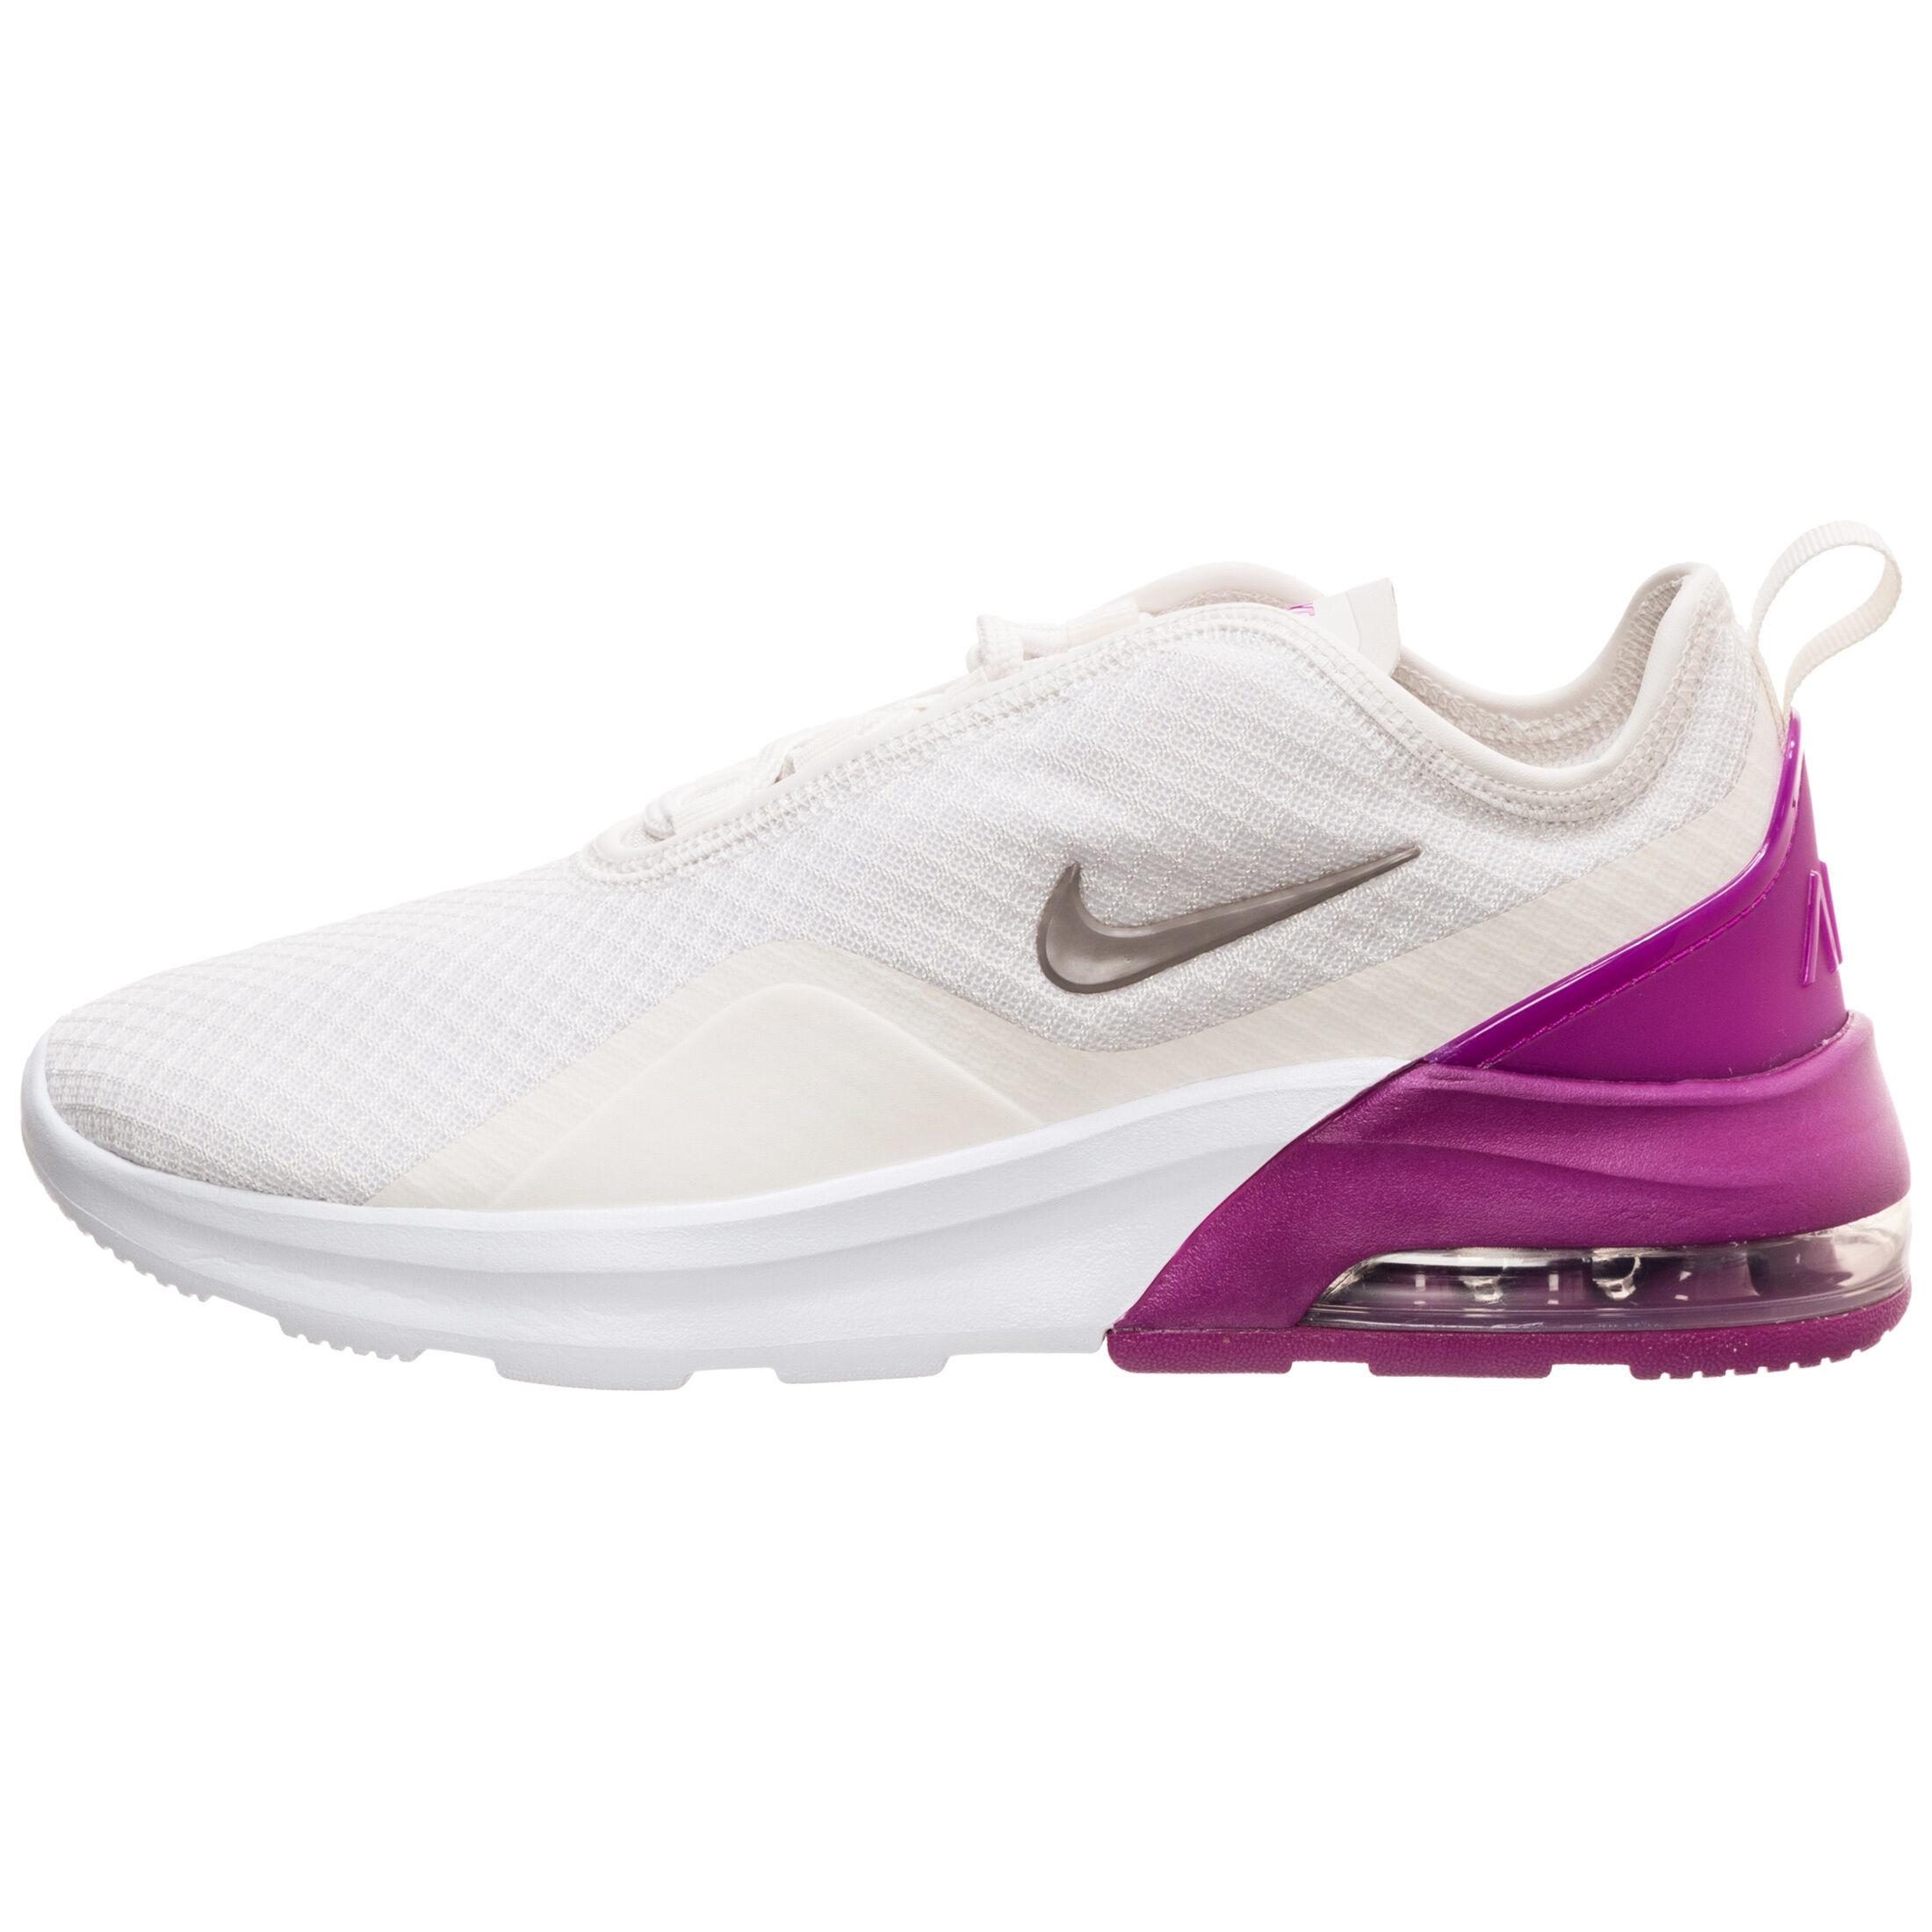 super popular fashion official images Nike Schuhe Reklamieren Damen Free 4.0 V2 Hellgrau Nike